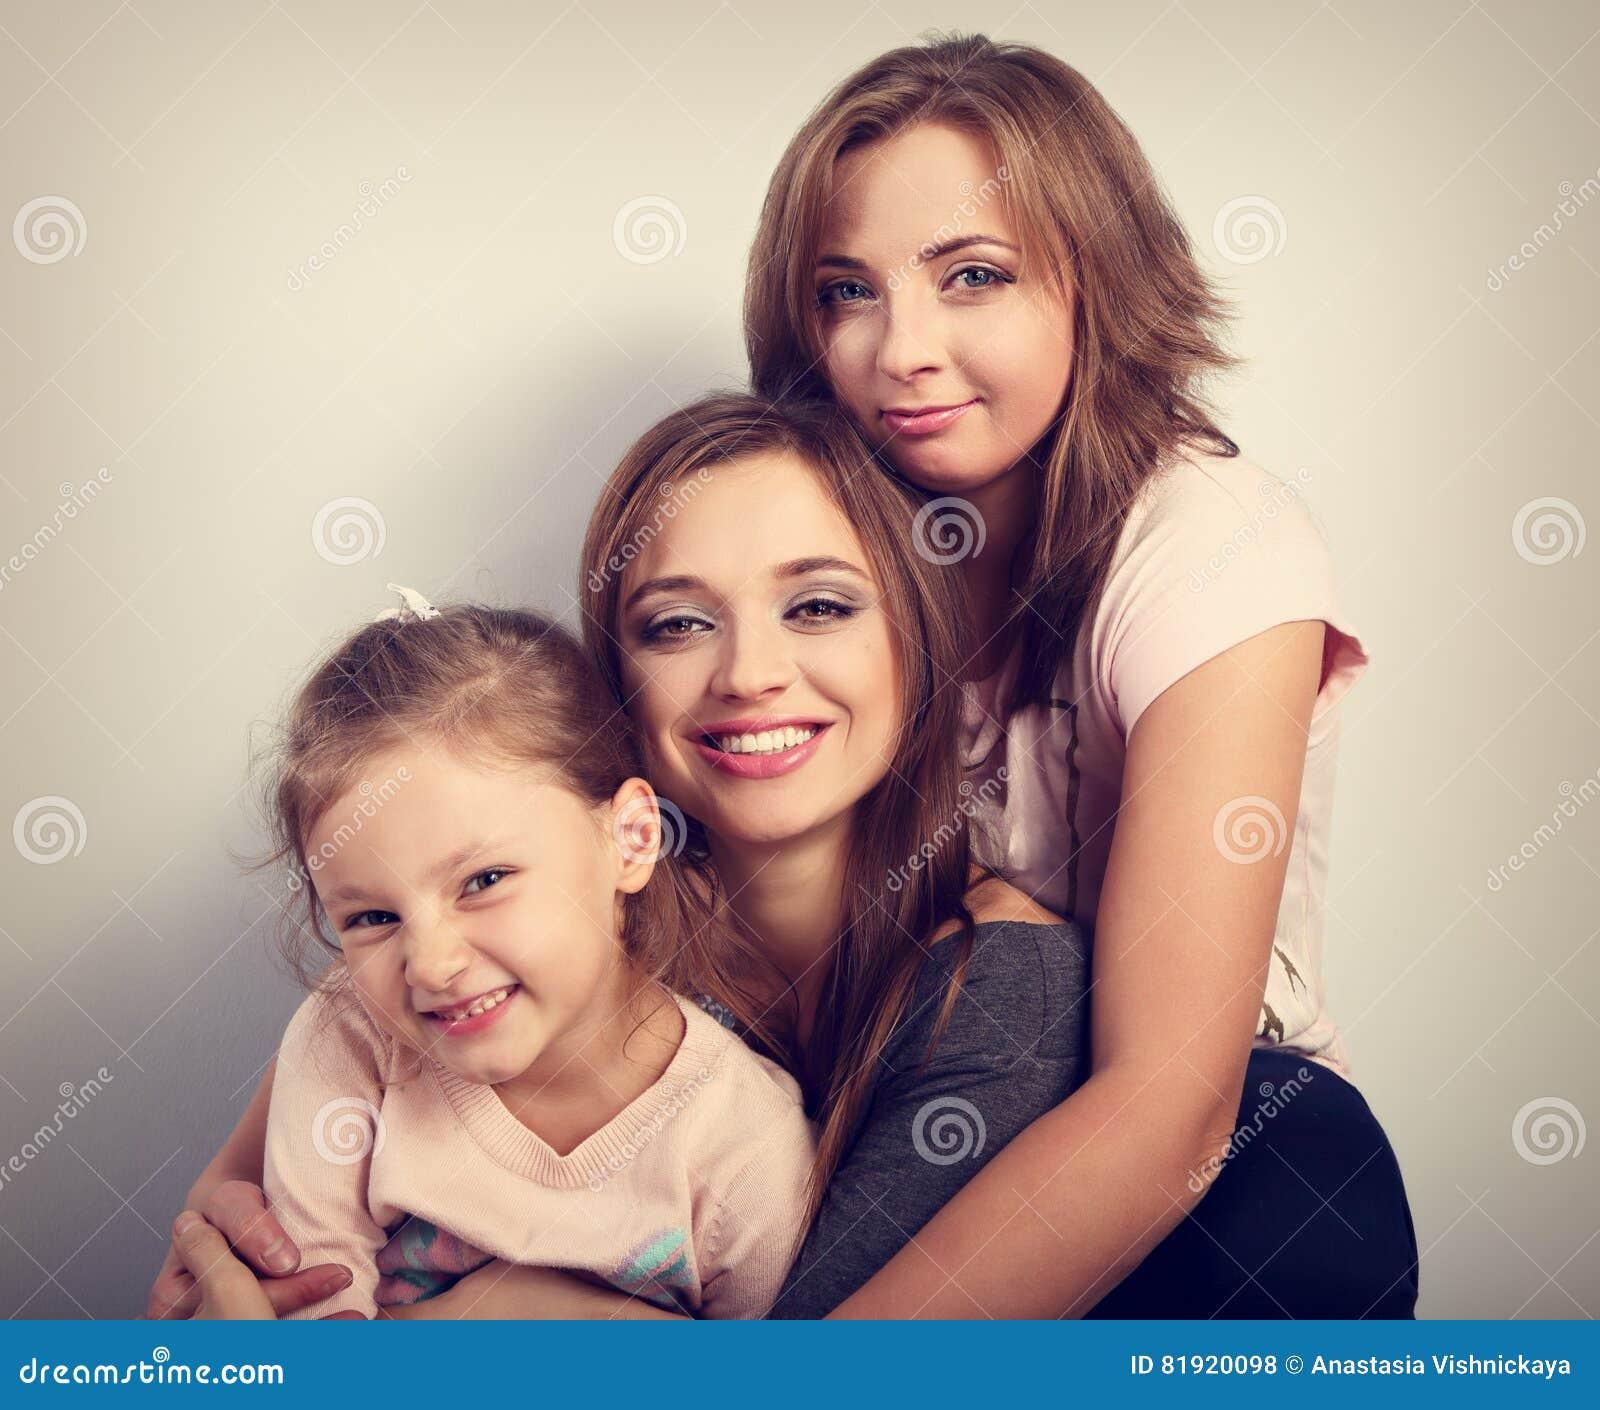 Twee jonge mooie glimlachende vrouwen en gelukkig joying jong geitjemeisje hugg